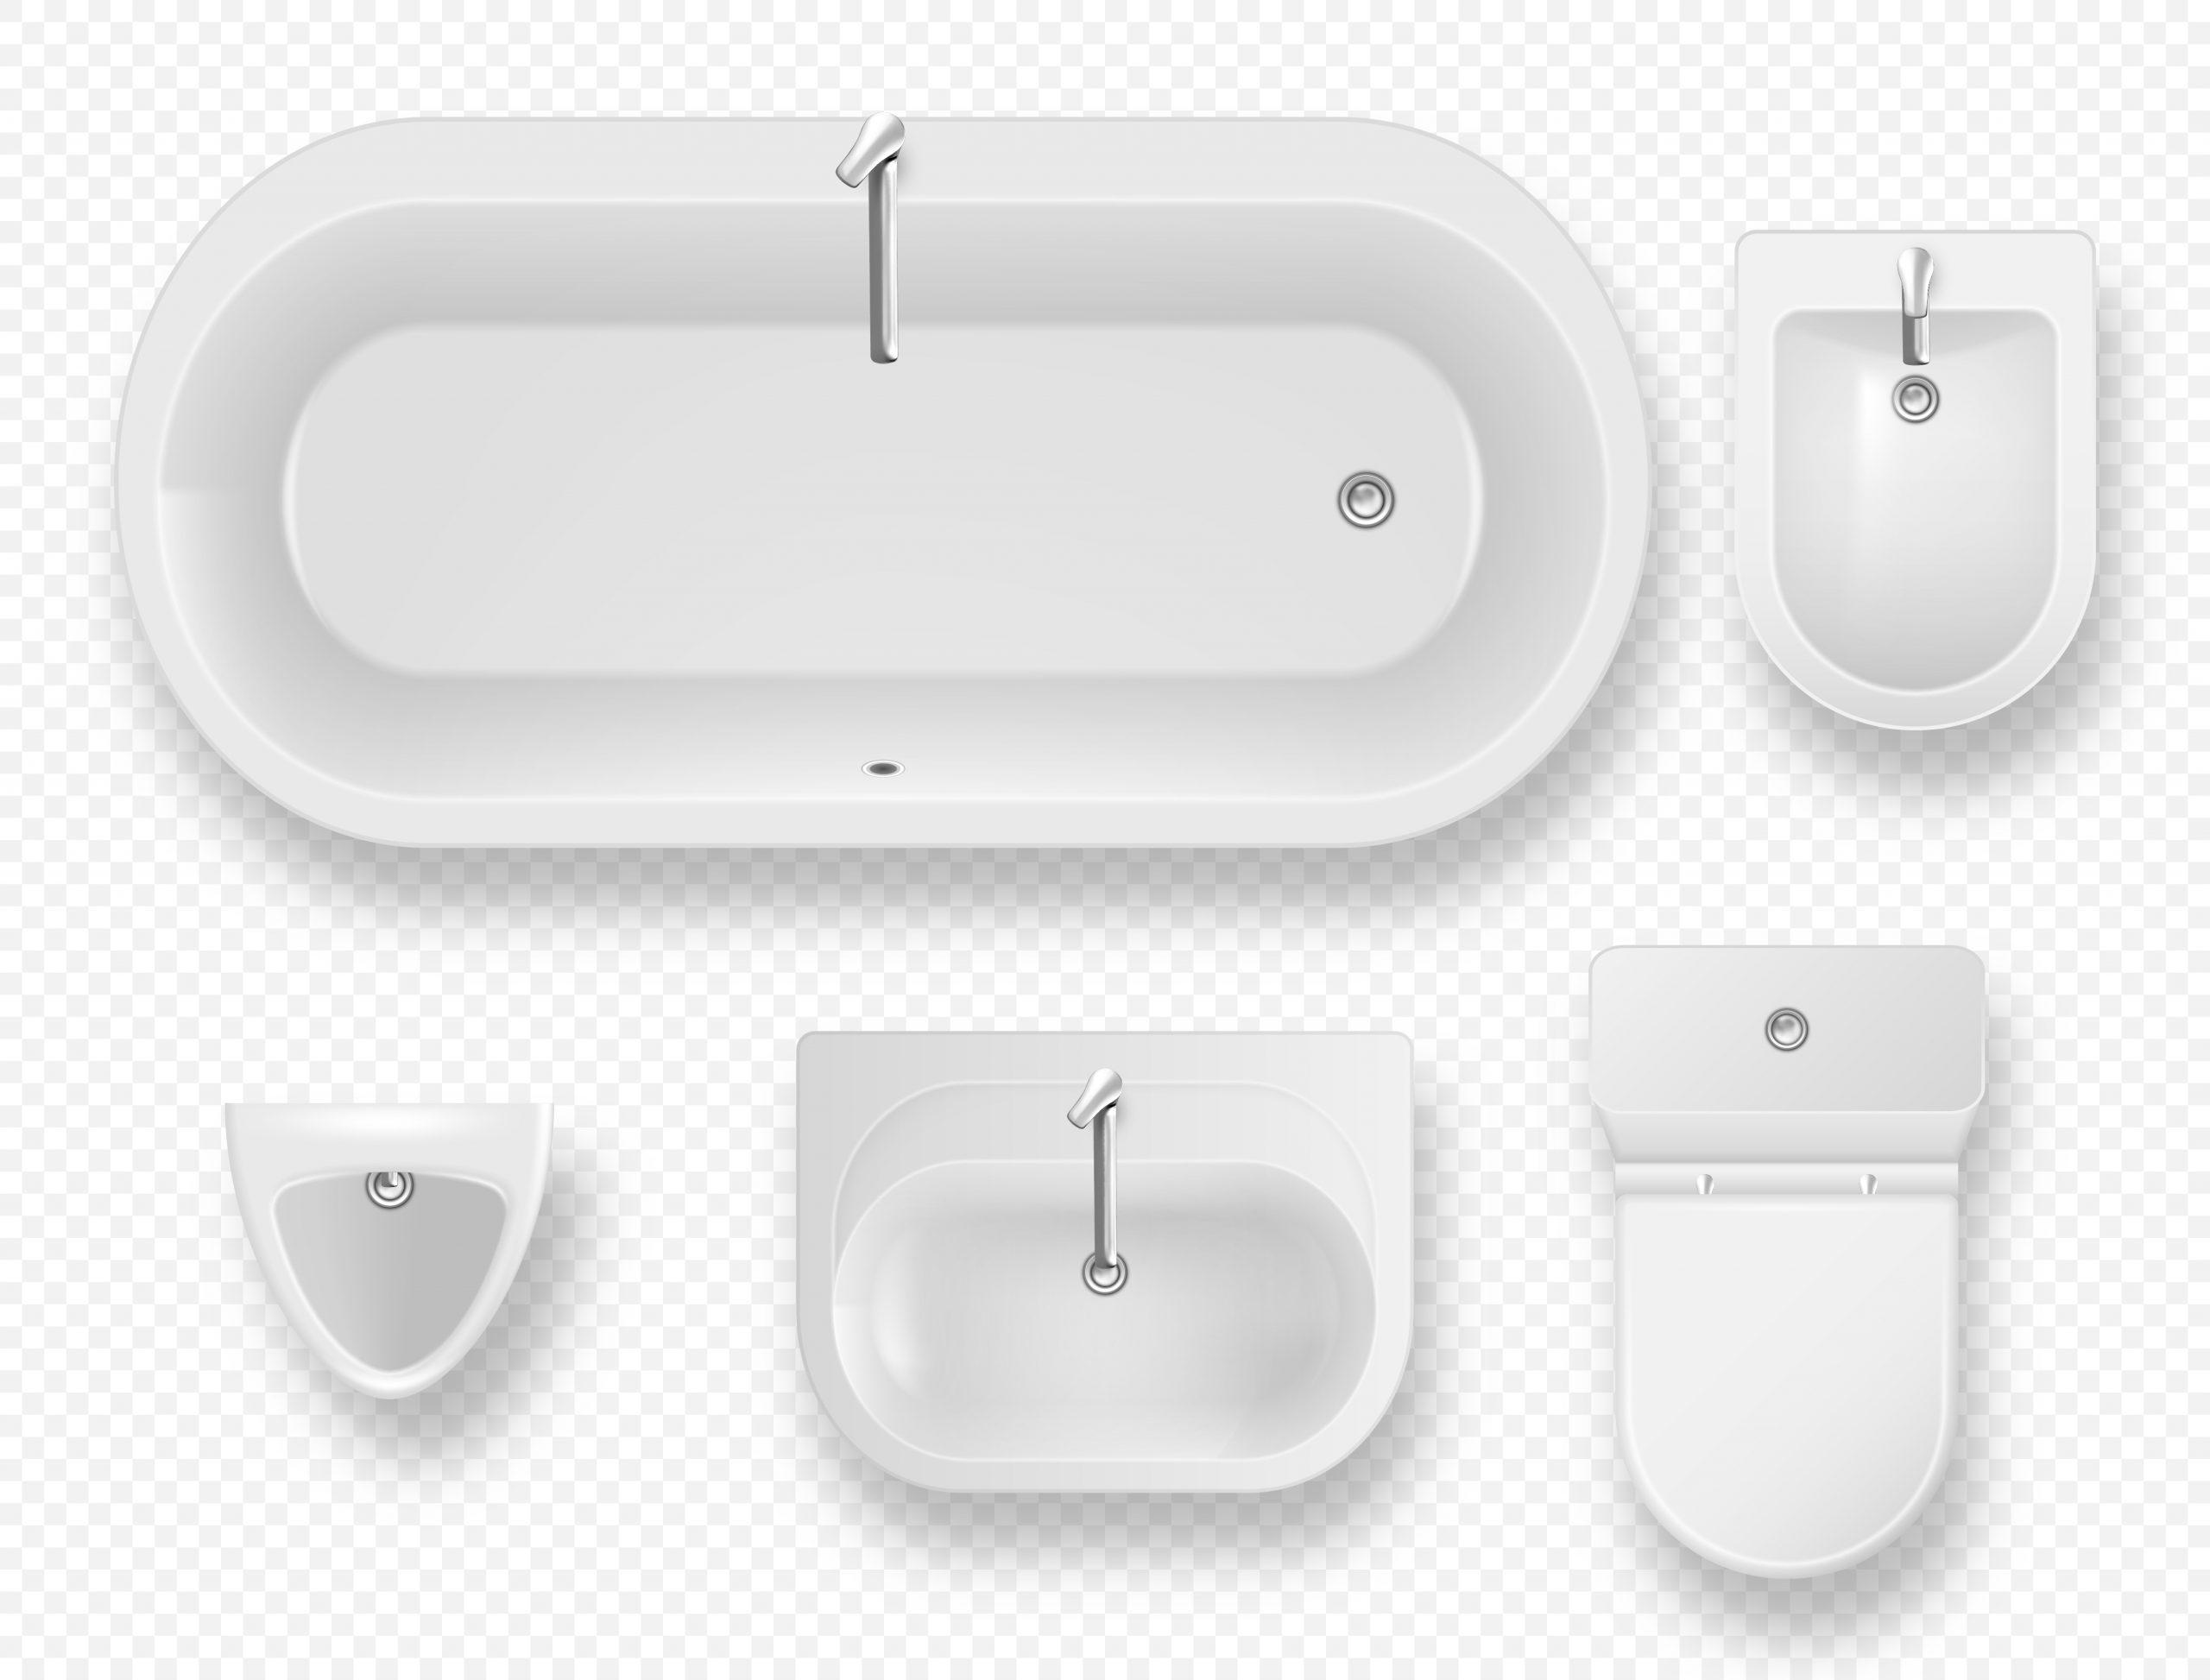 Best 1 Piece Tub Shower Combo